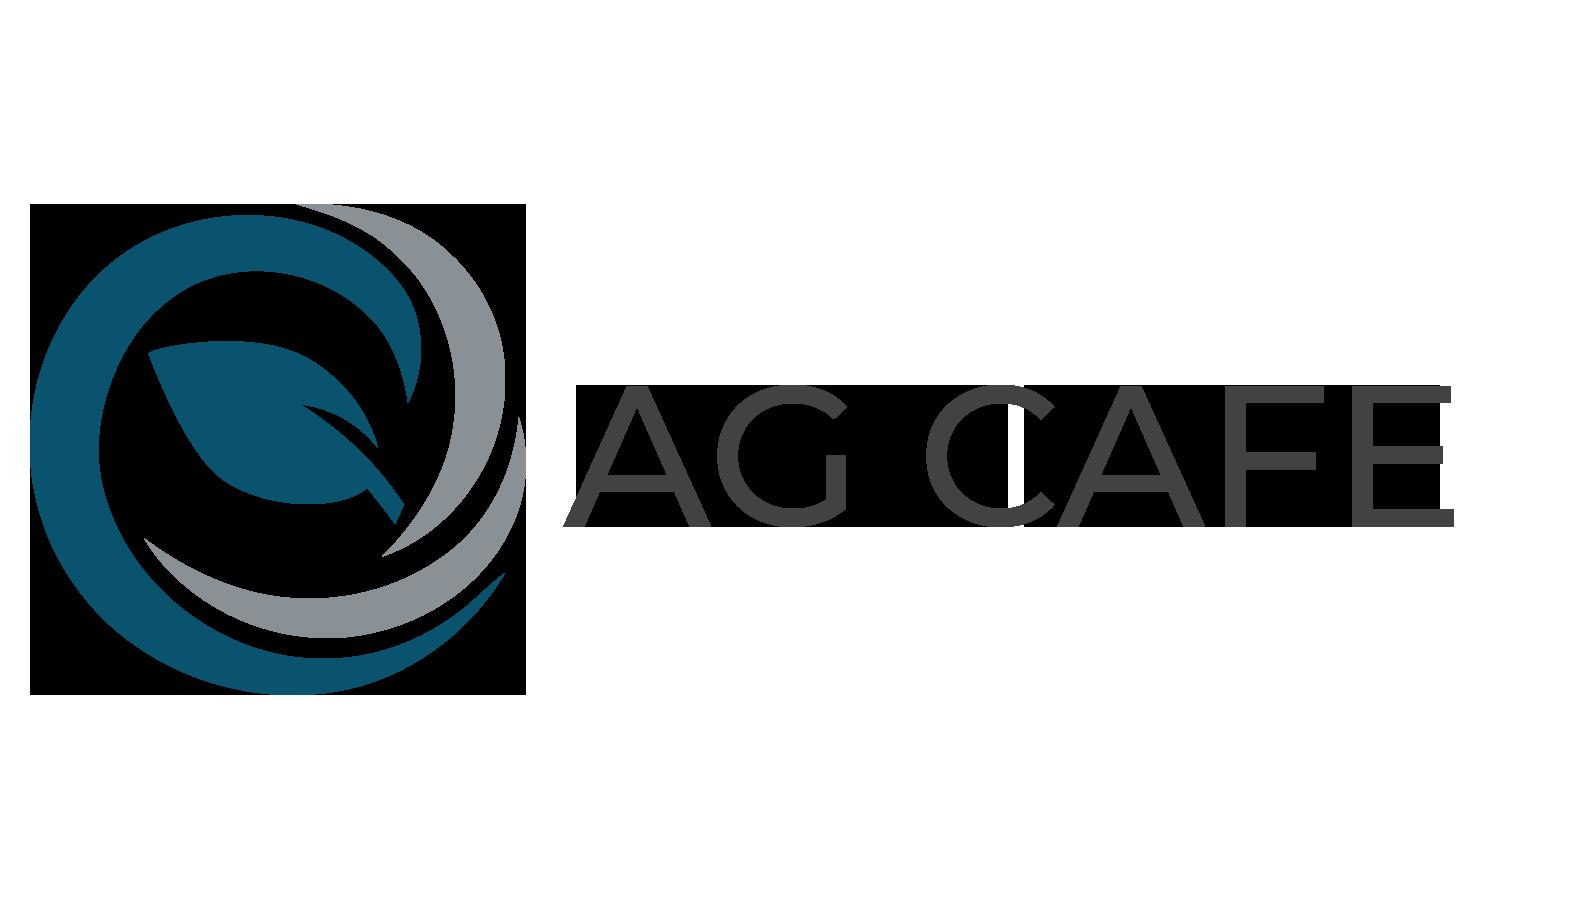 DRCC-AgCafe